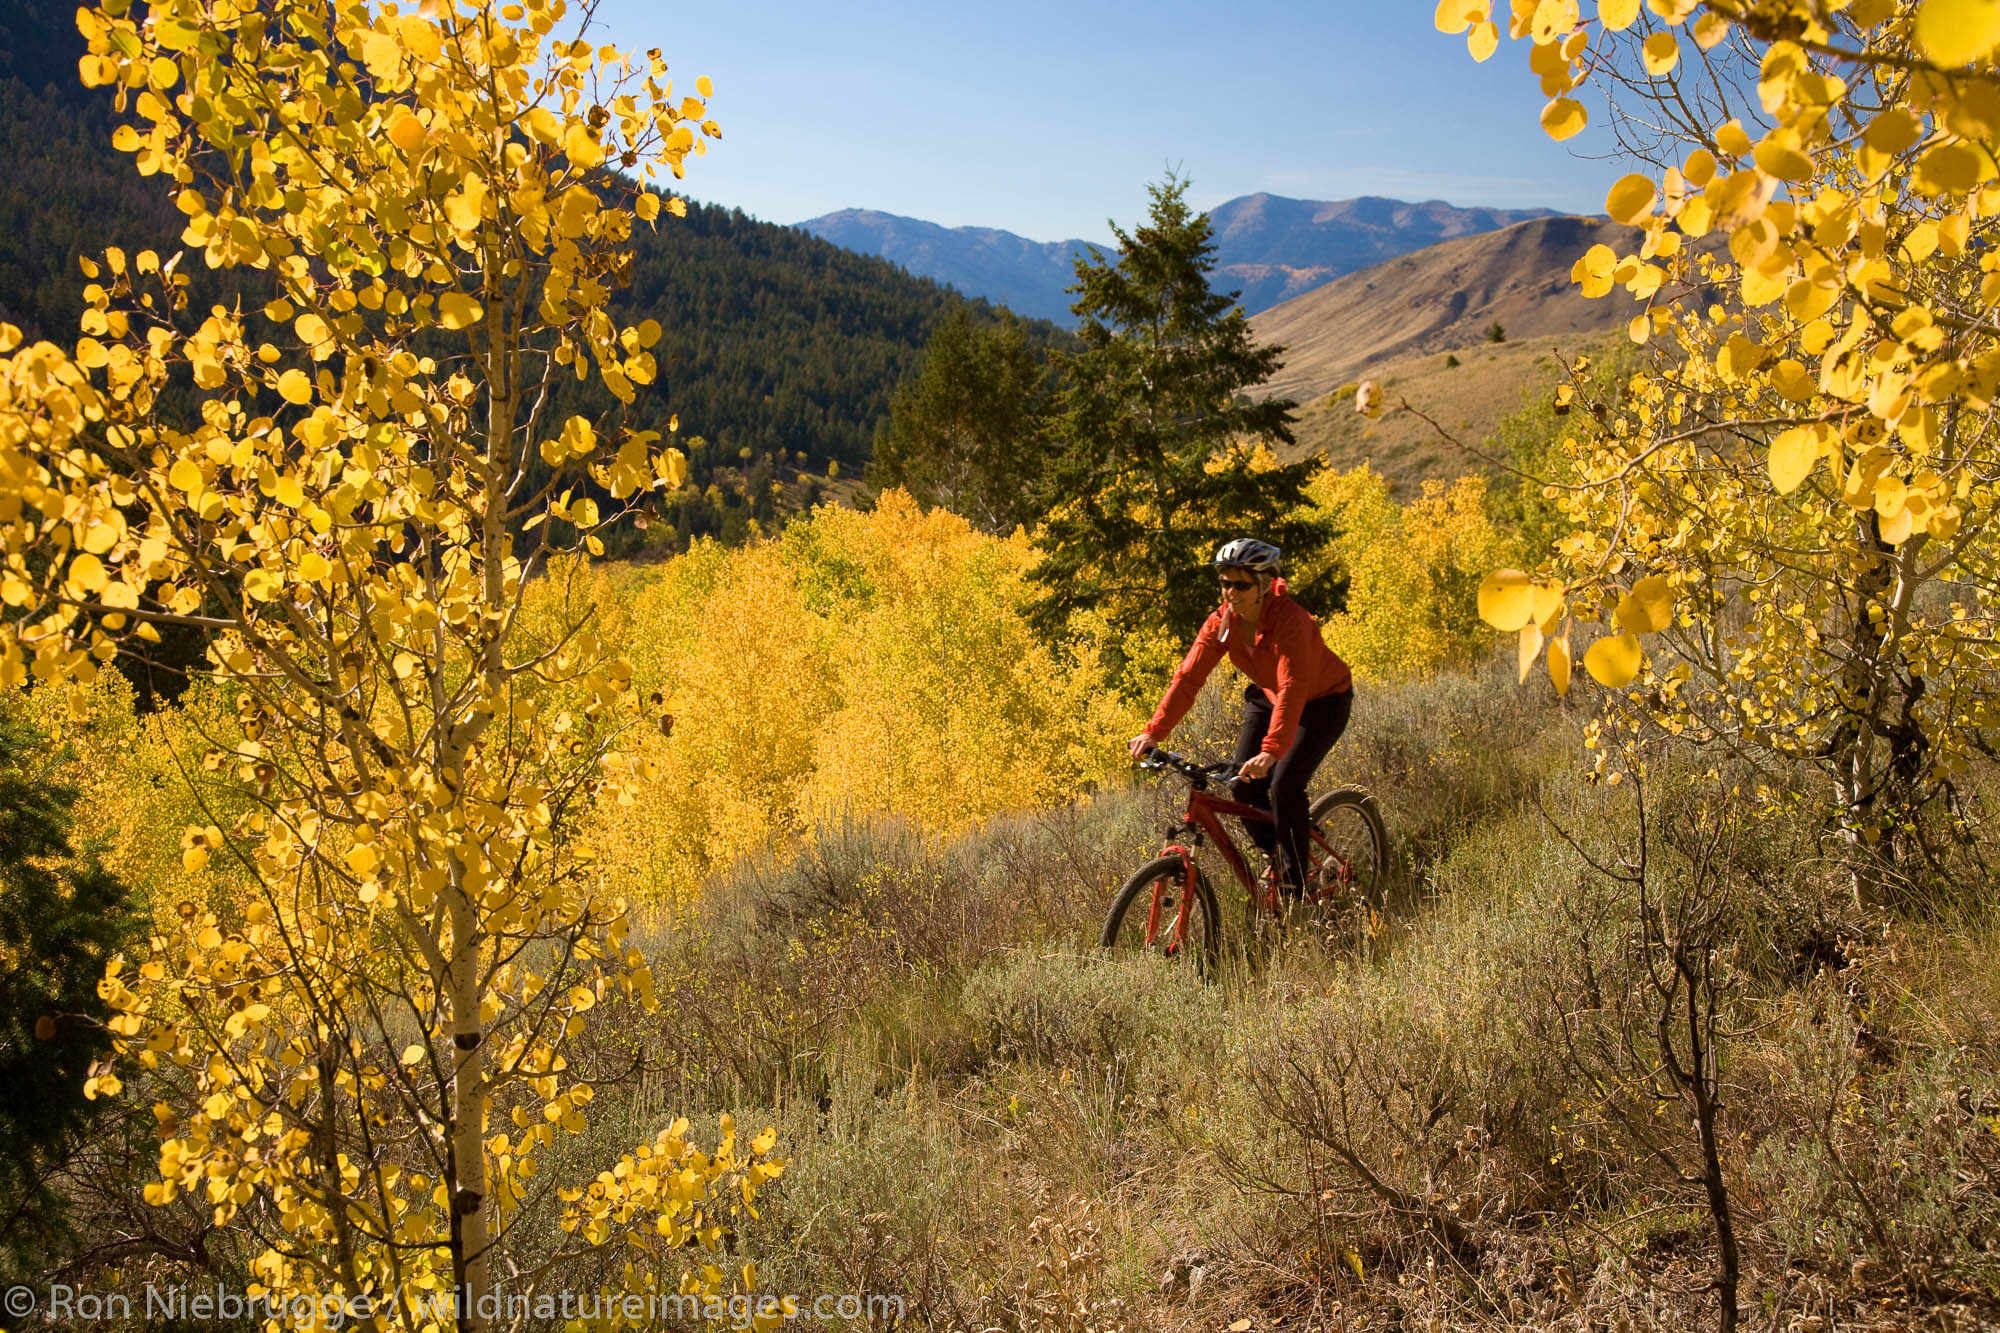 Mountain biking in Bridger-Teton National Forest, Jackson Hole, Wyoming.